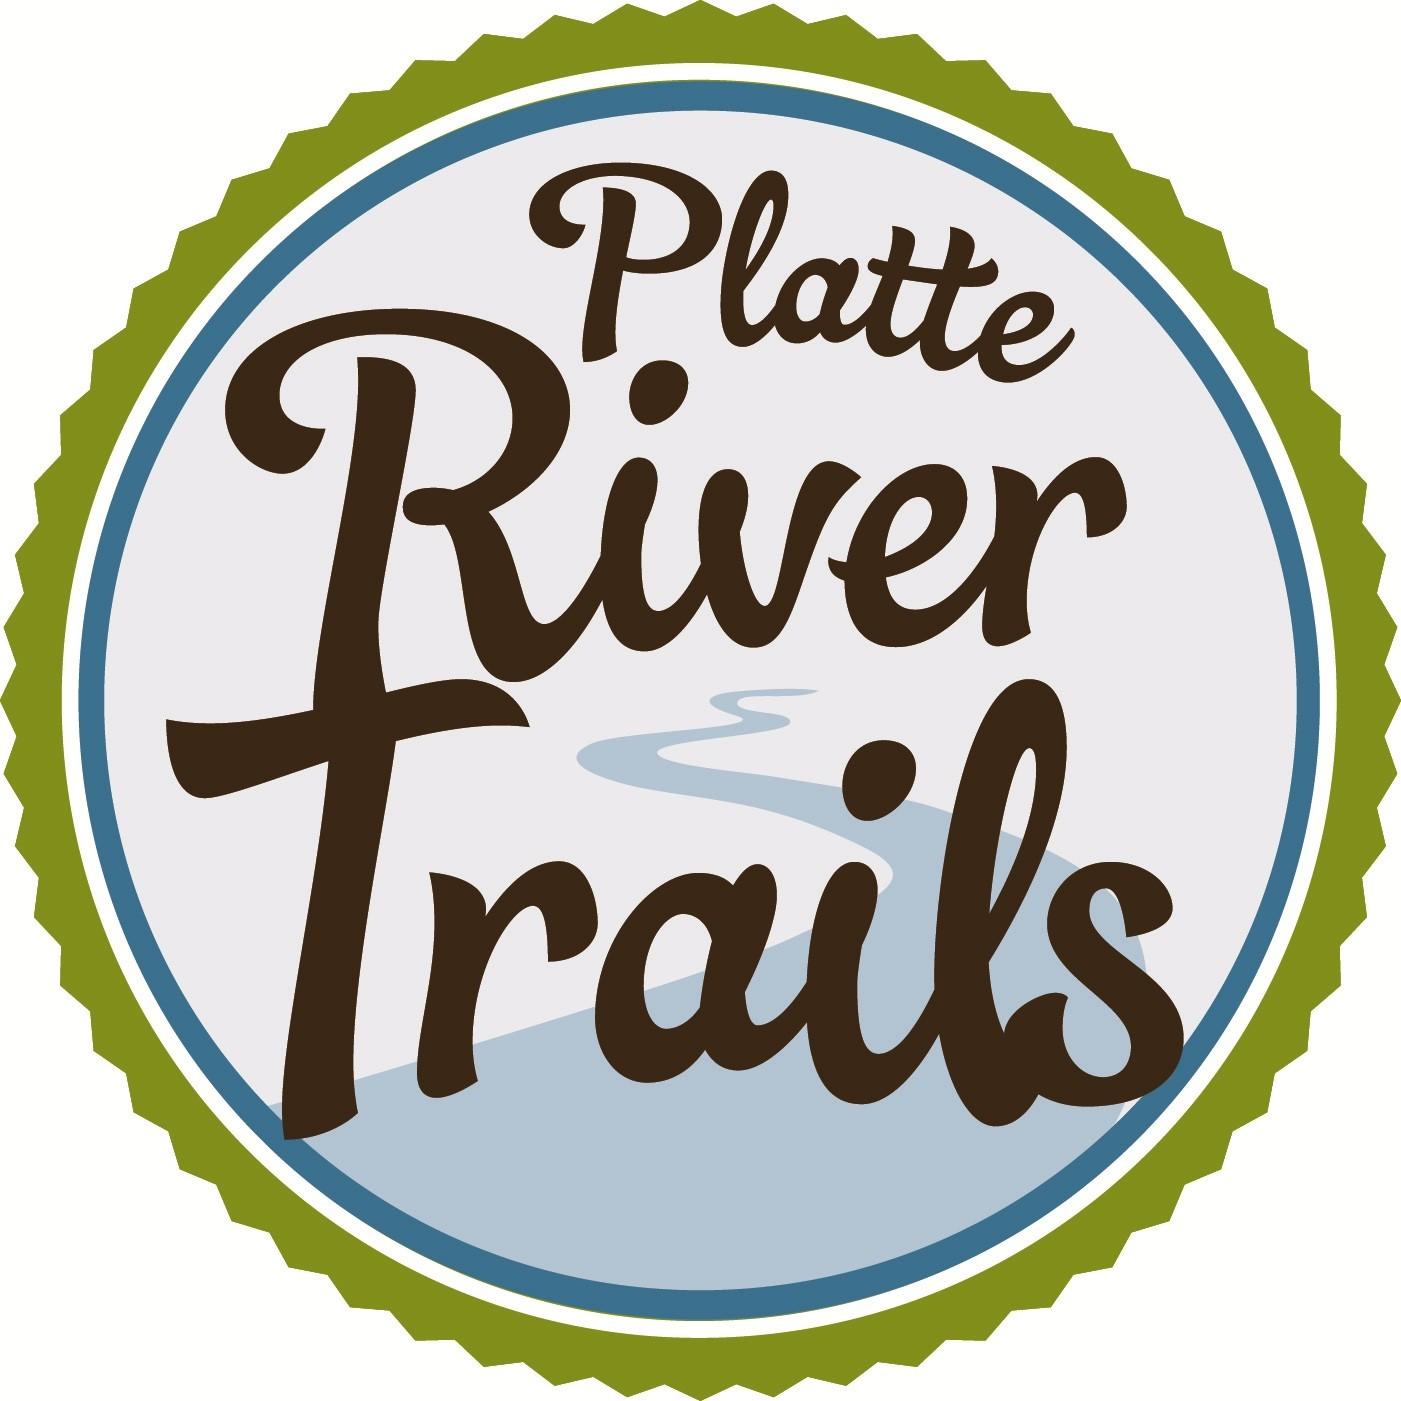 PlatteRiverTrails